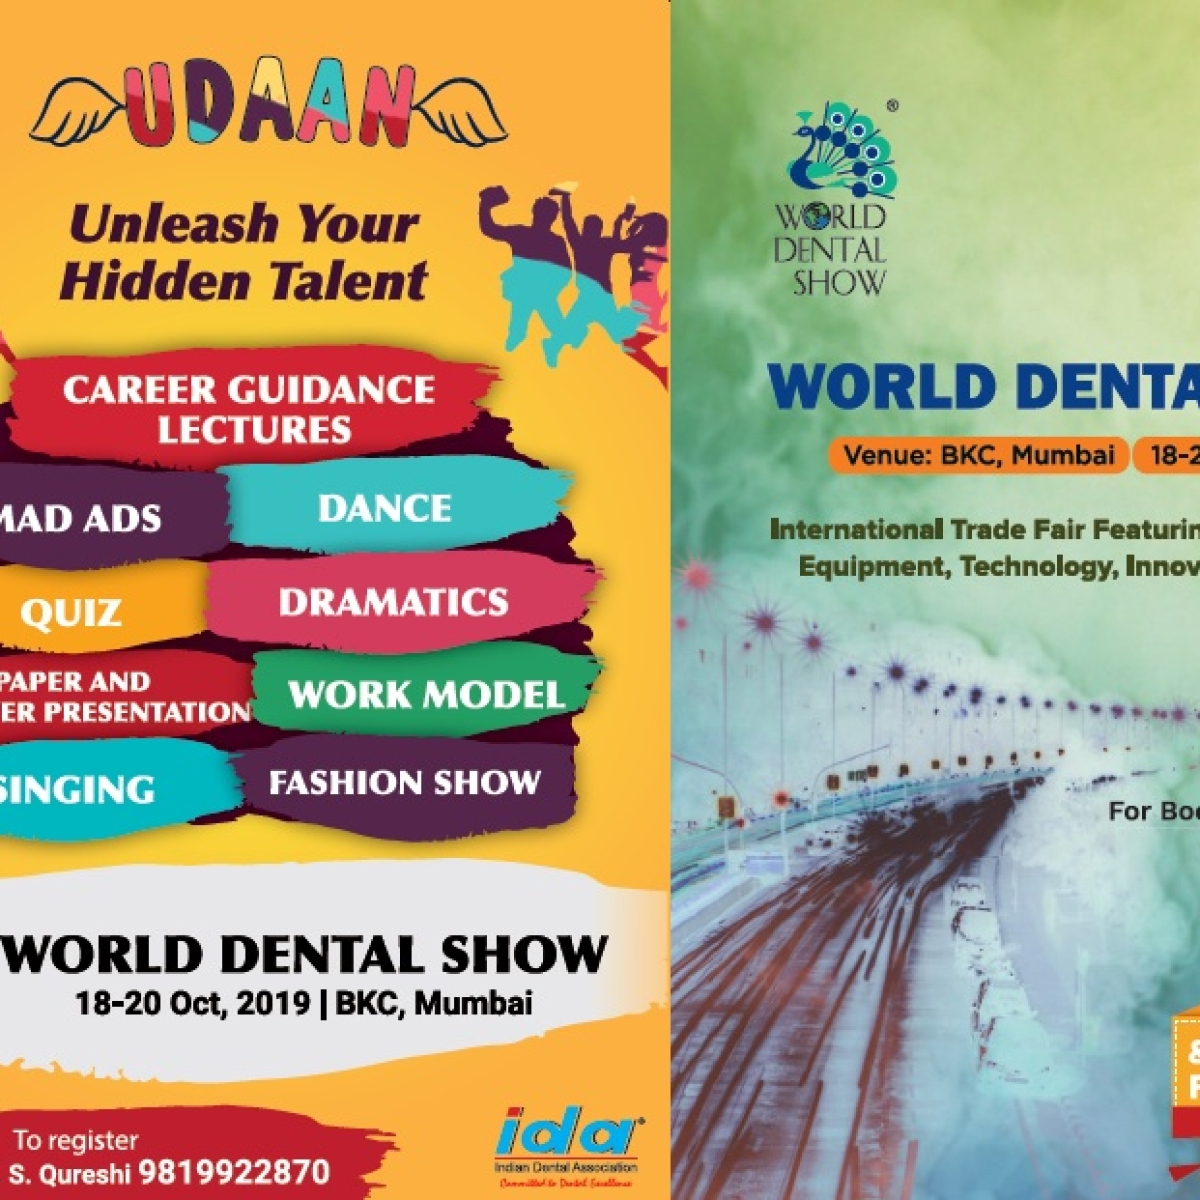 World Dental Show 2019